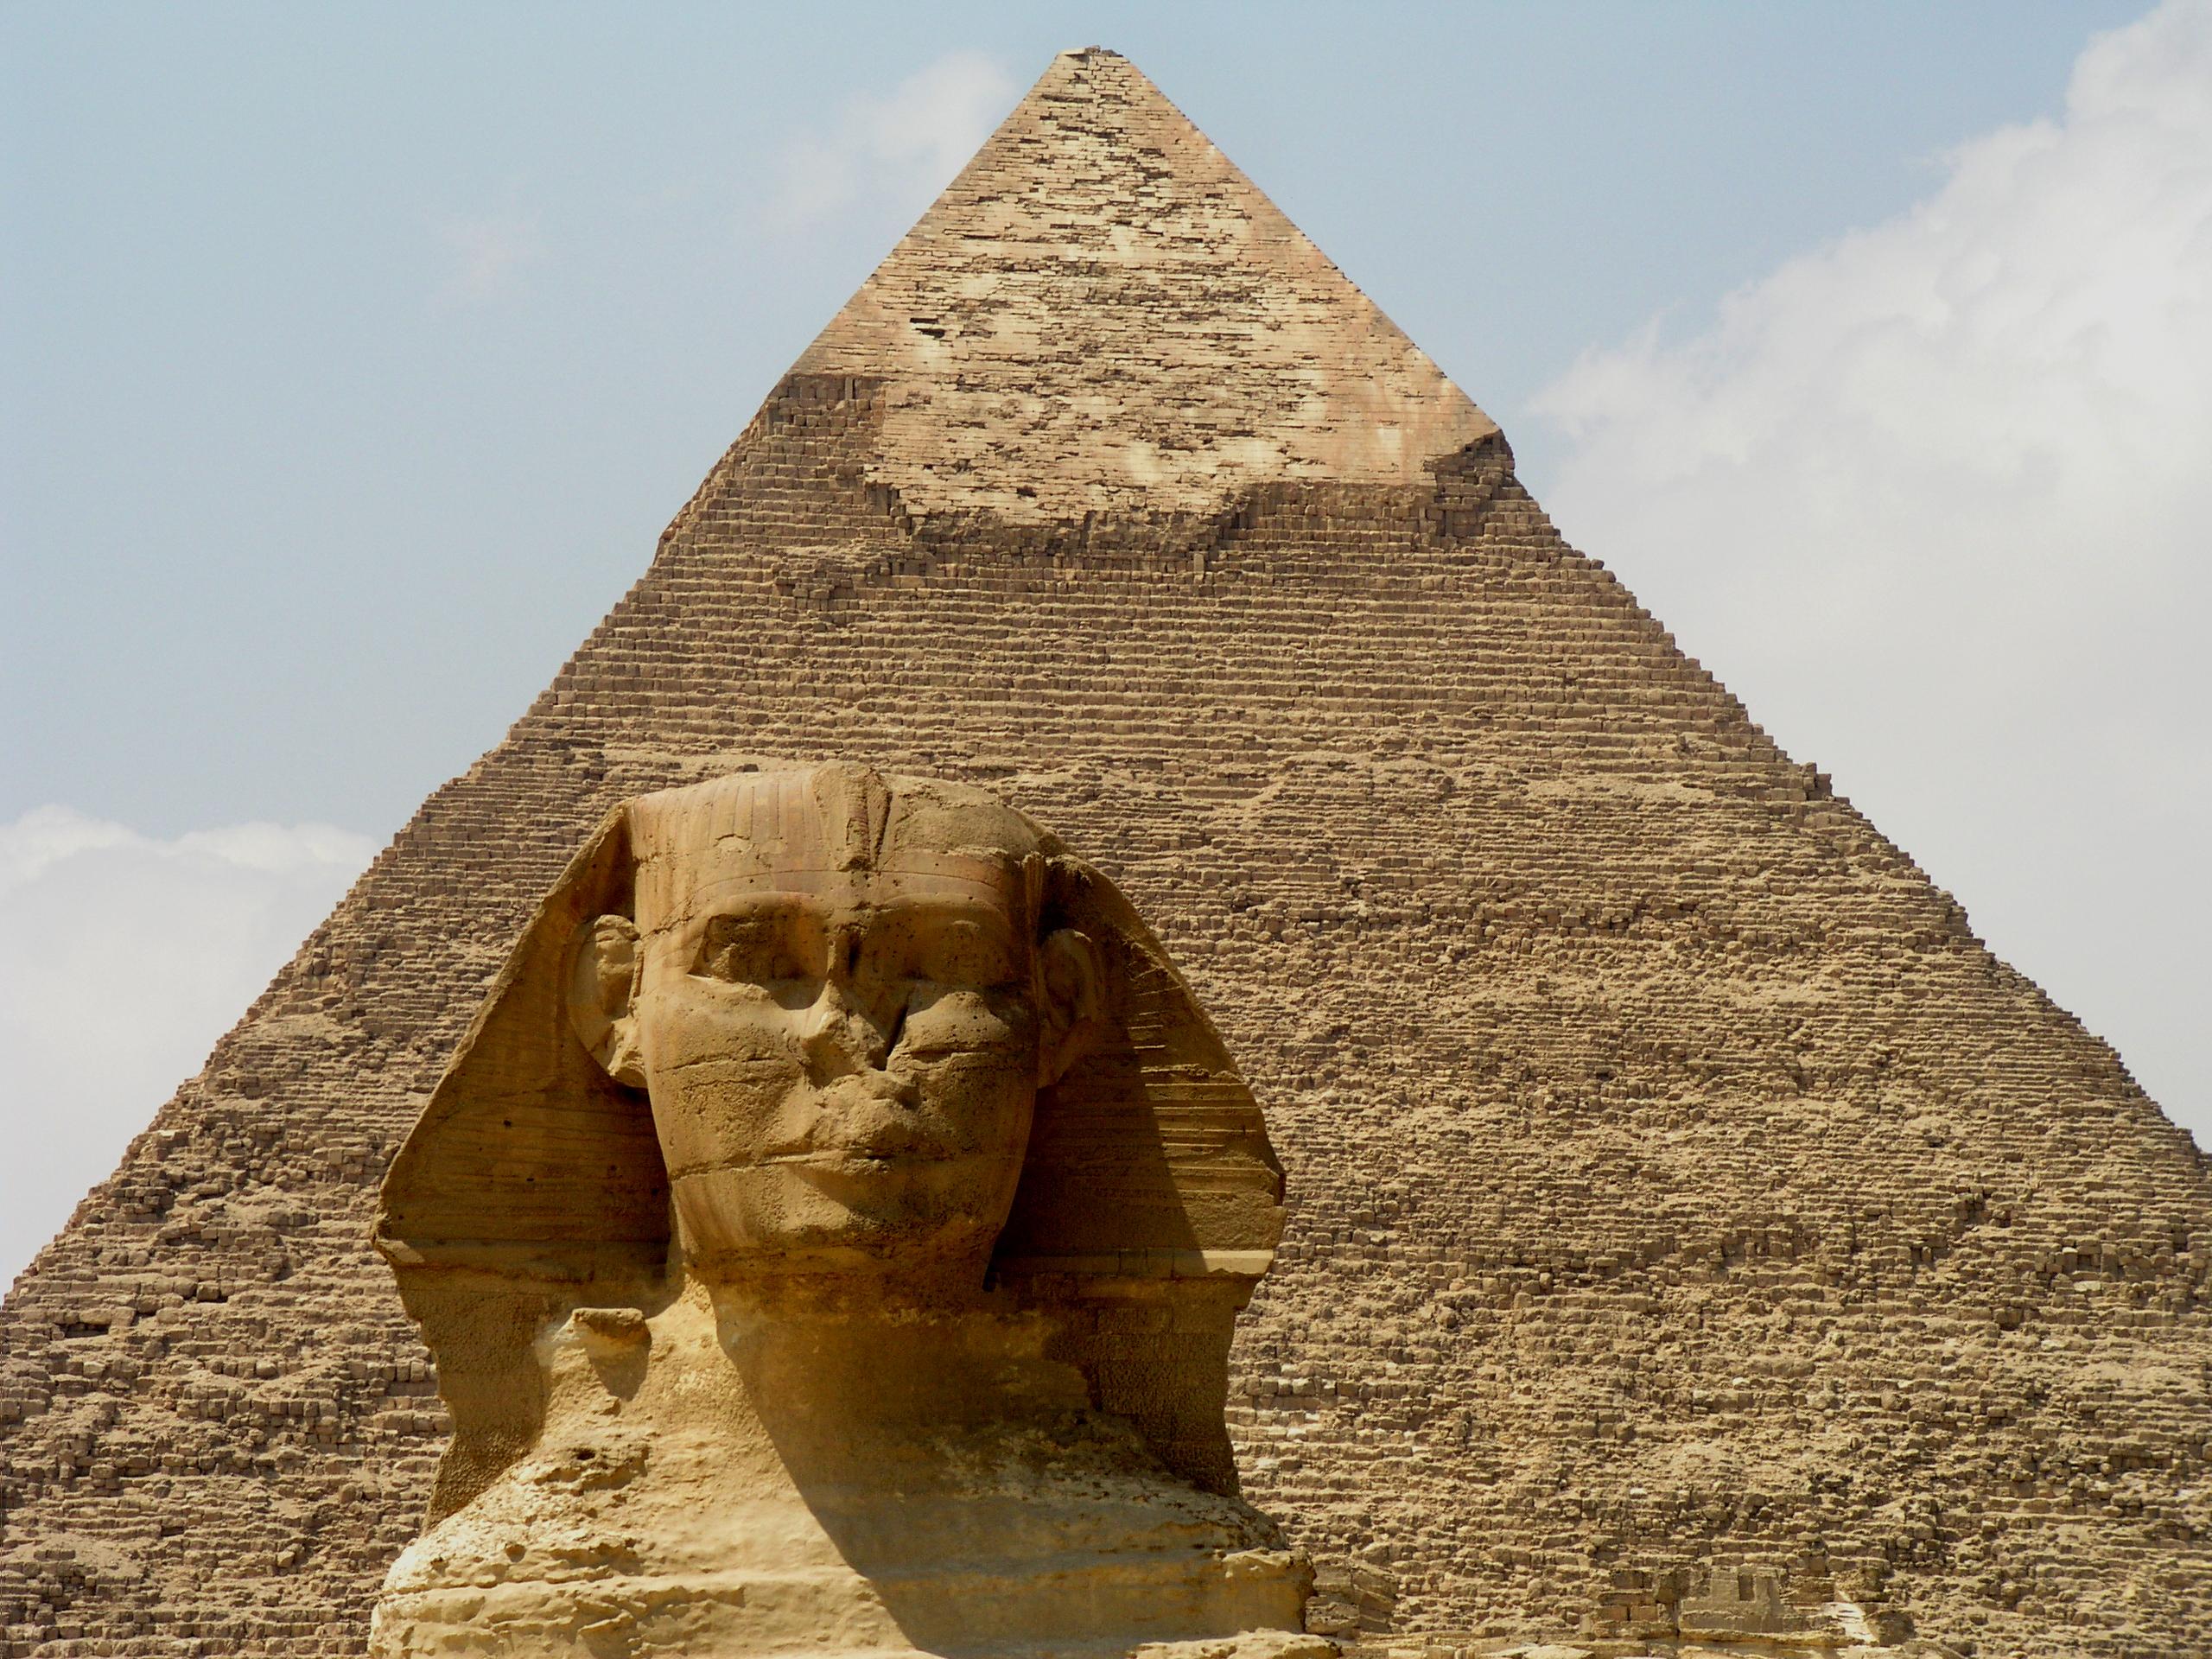 egypt pyramids sphinx inside - photo #20